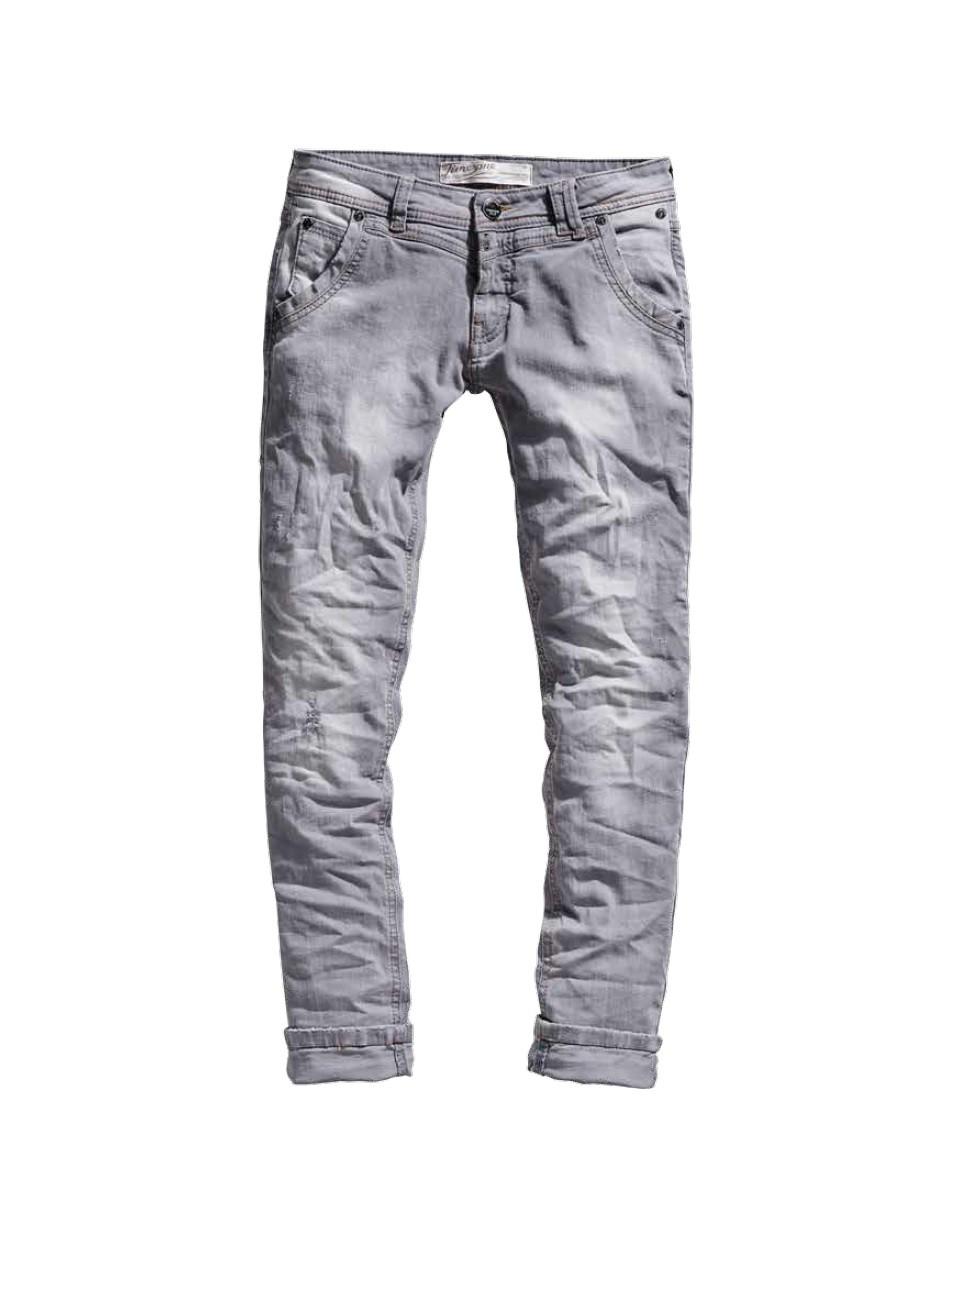 timezone damen 7 8 jeans nalitz 16 5405 slim fit light grey destroy neu ebay. Black Bedroom Furniture Sets. Home Design Ideas